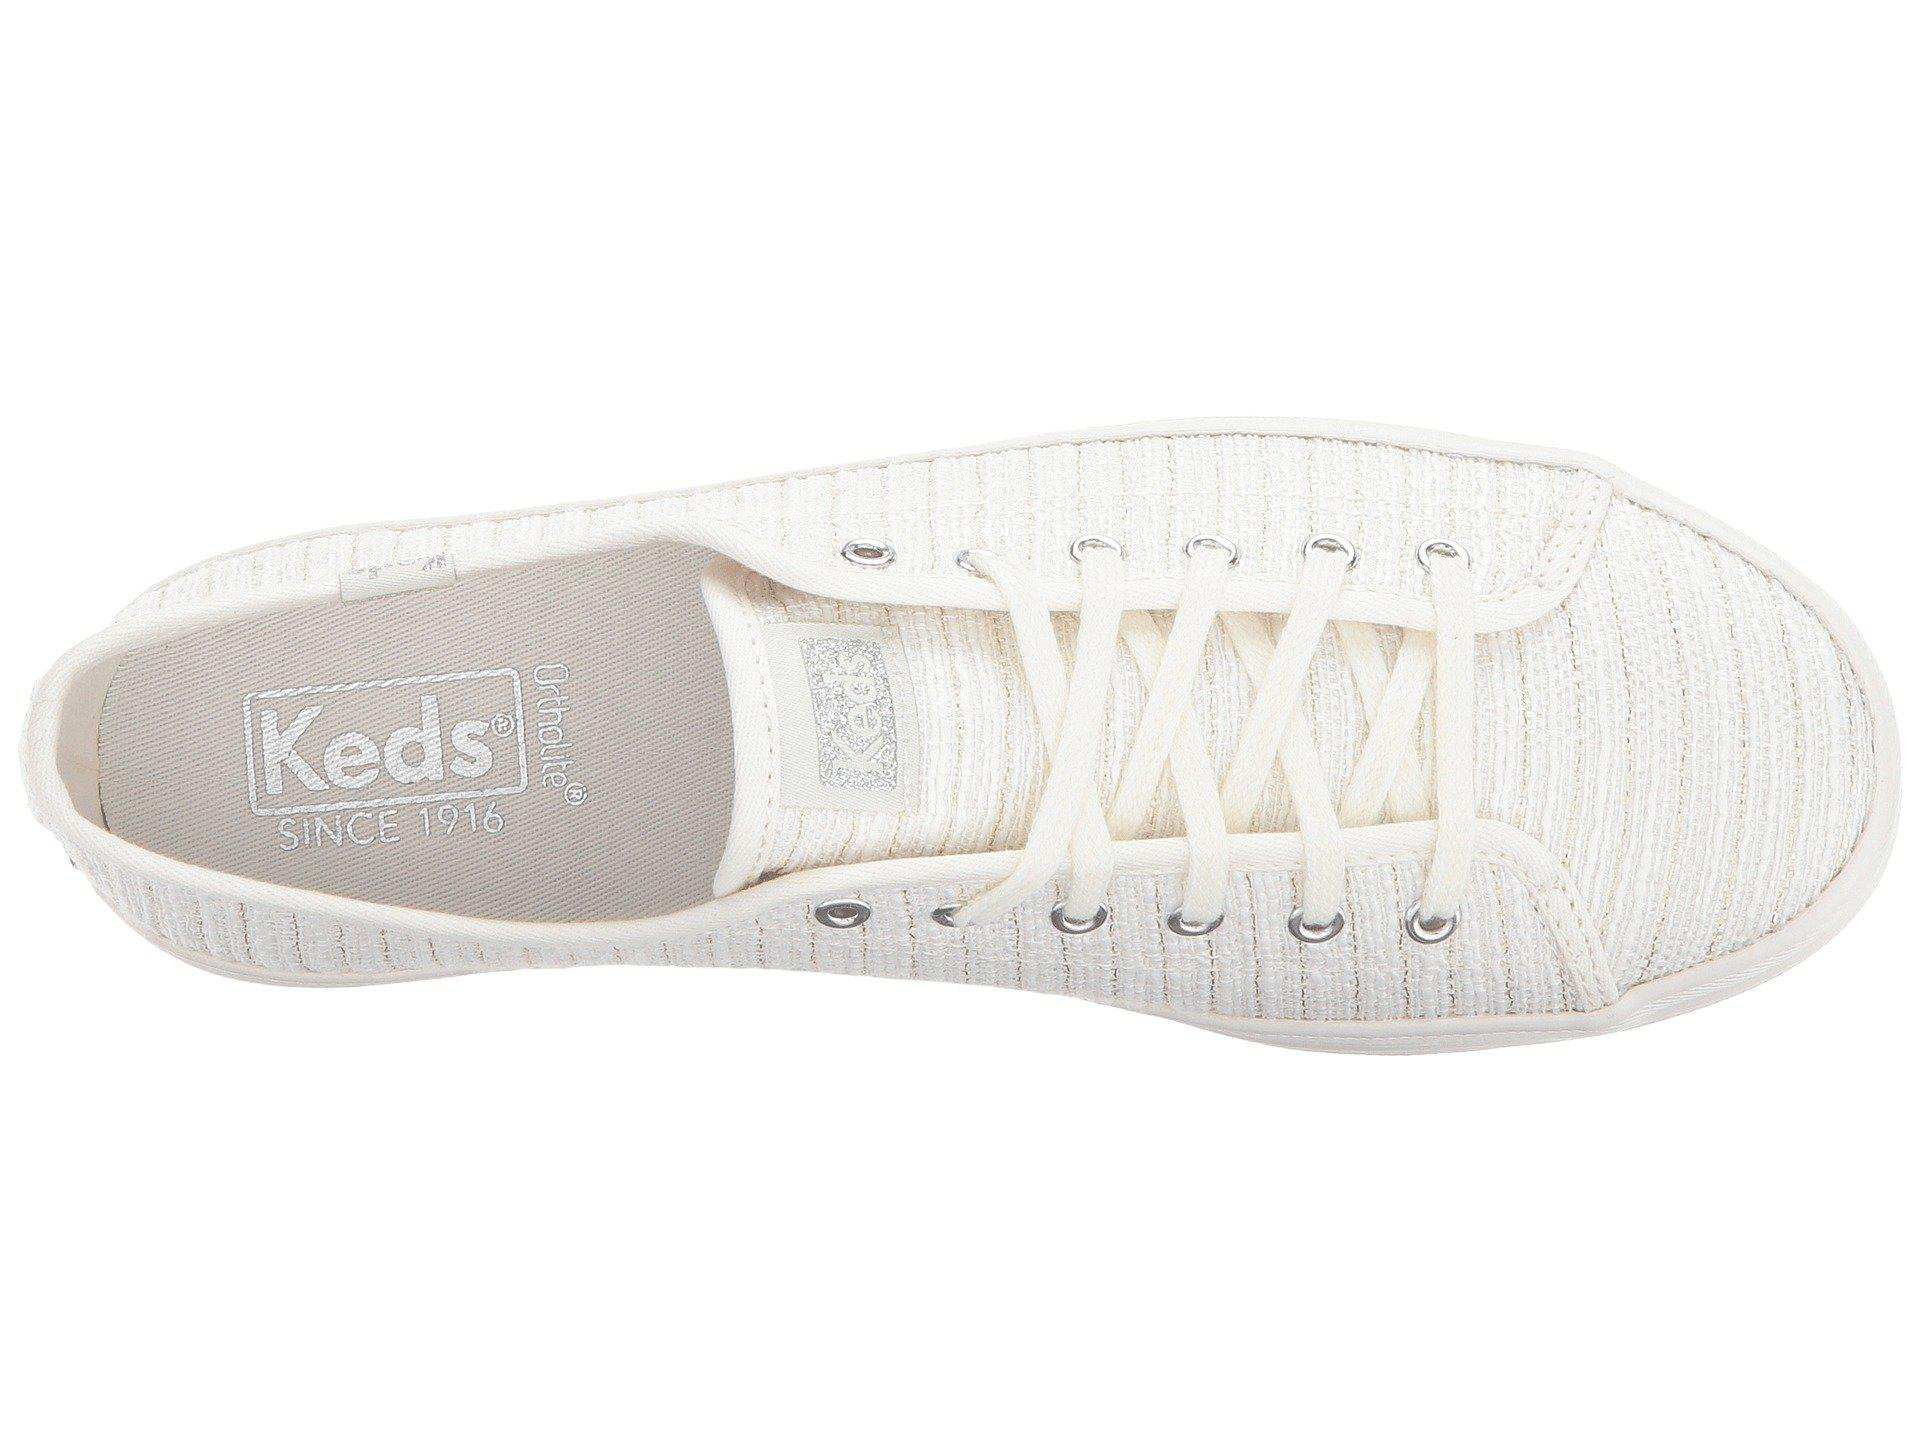 Keds Kickstart Lurex Stripe Sneaker FOuxGVjacy